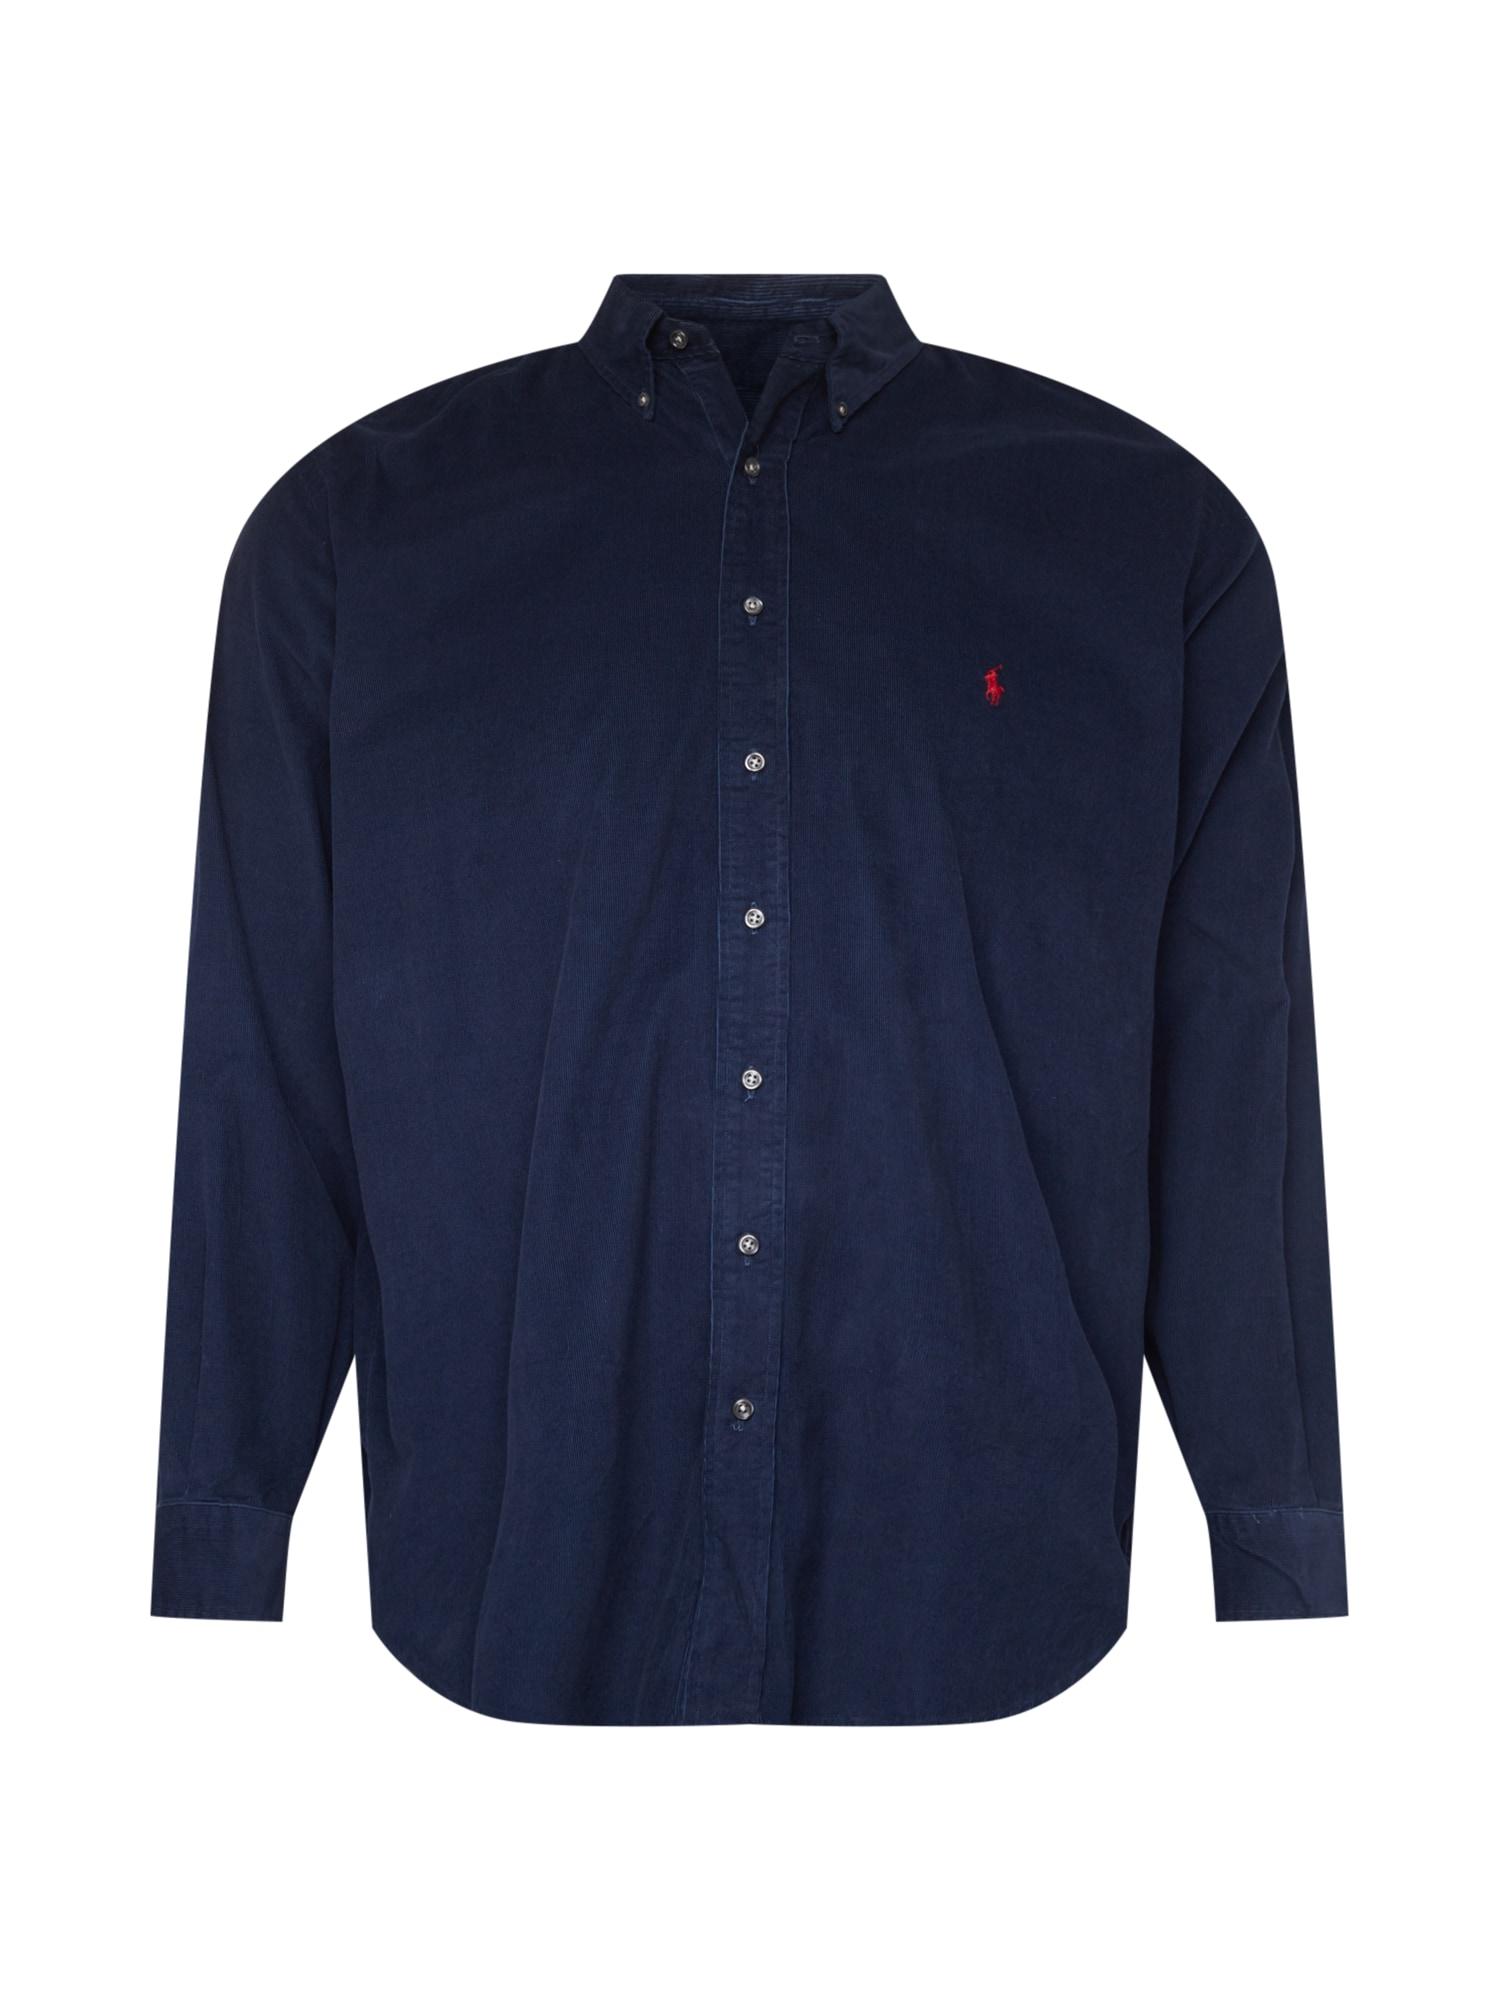 Polo Ralph Lauren Big & Tall Marškiniai tamsiai mėlyna